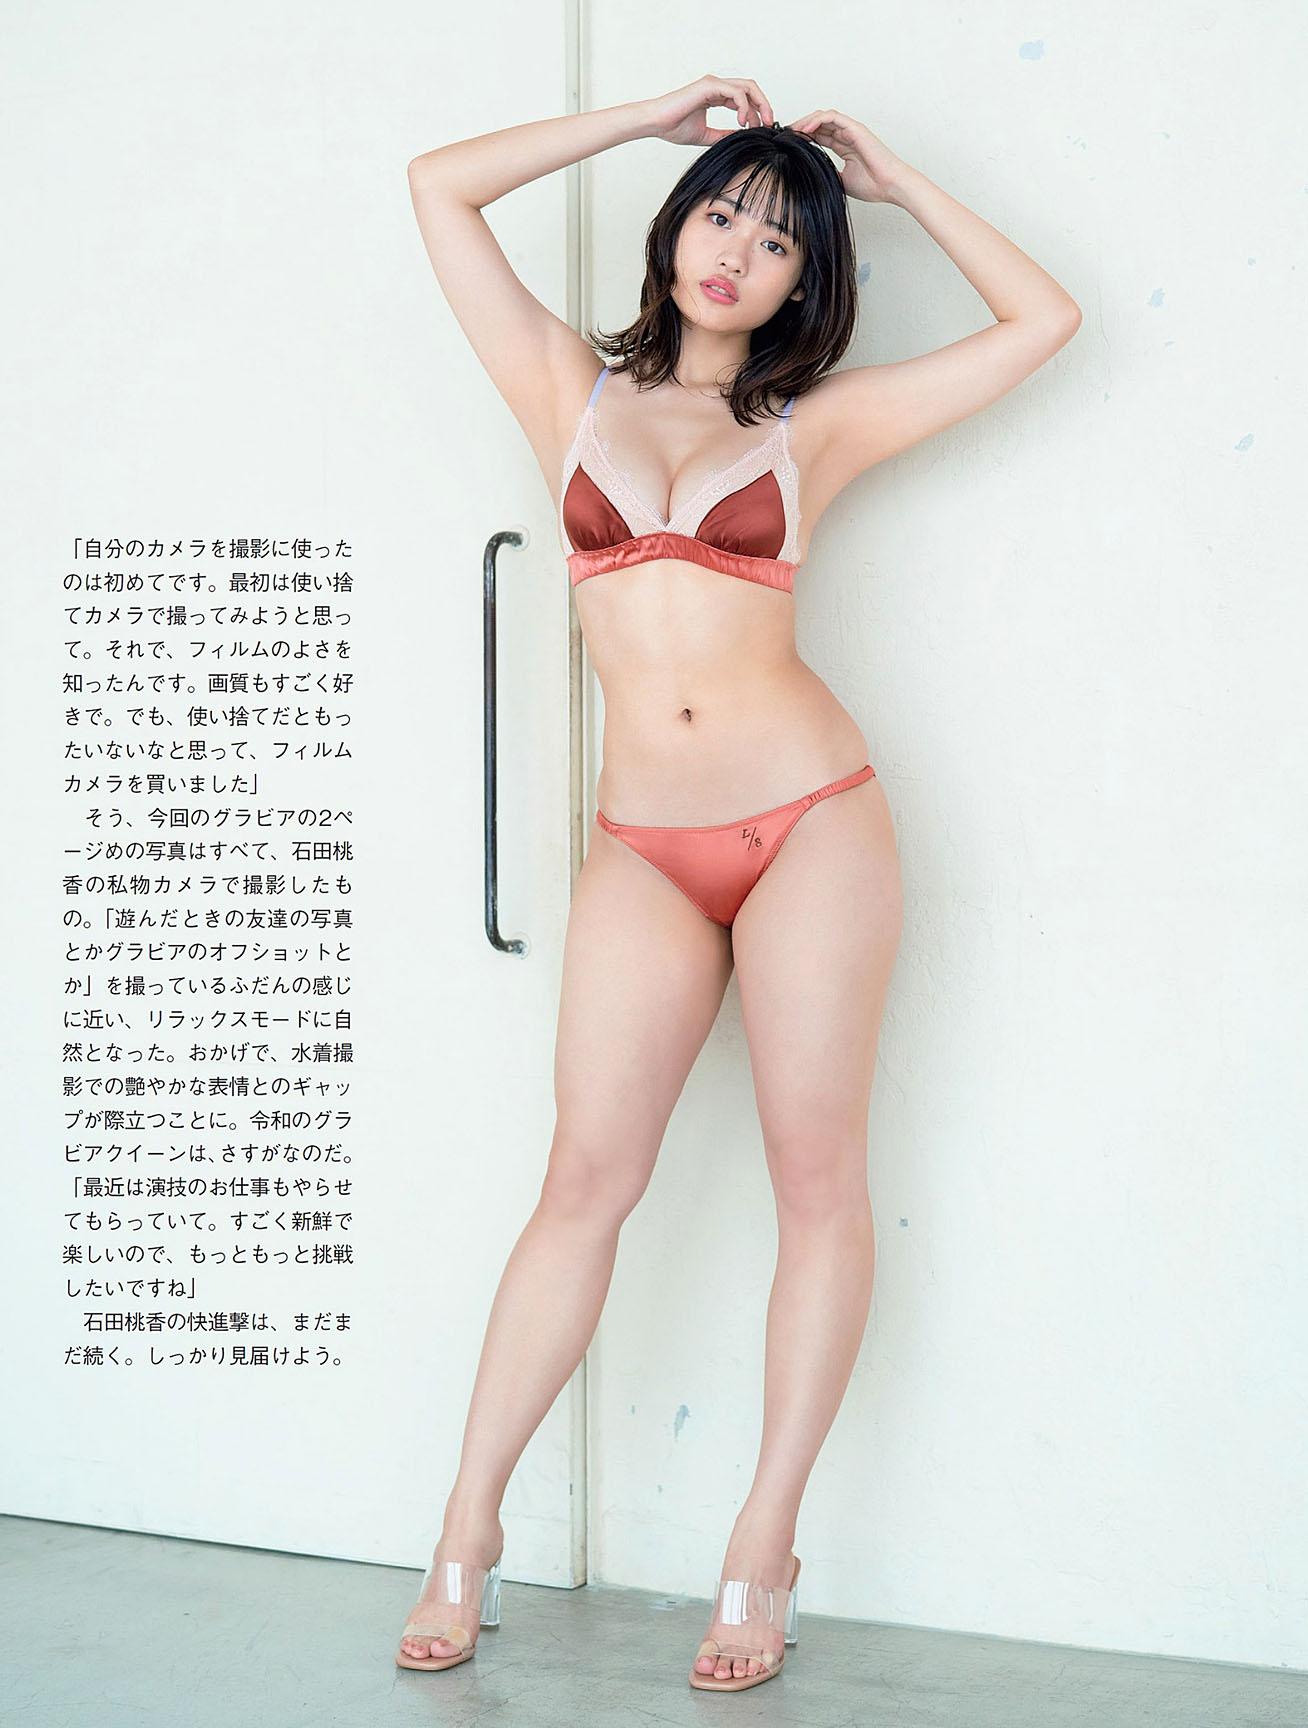 Momoka Ishida Flash 210209 07.jpg